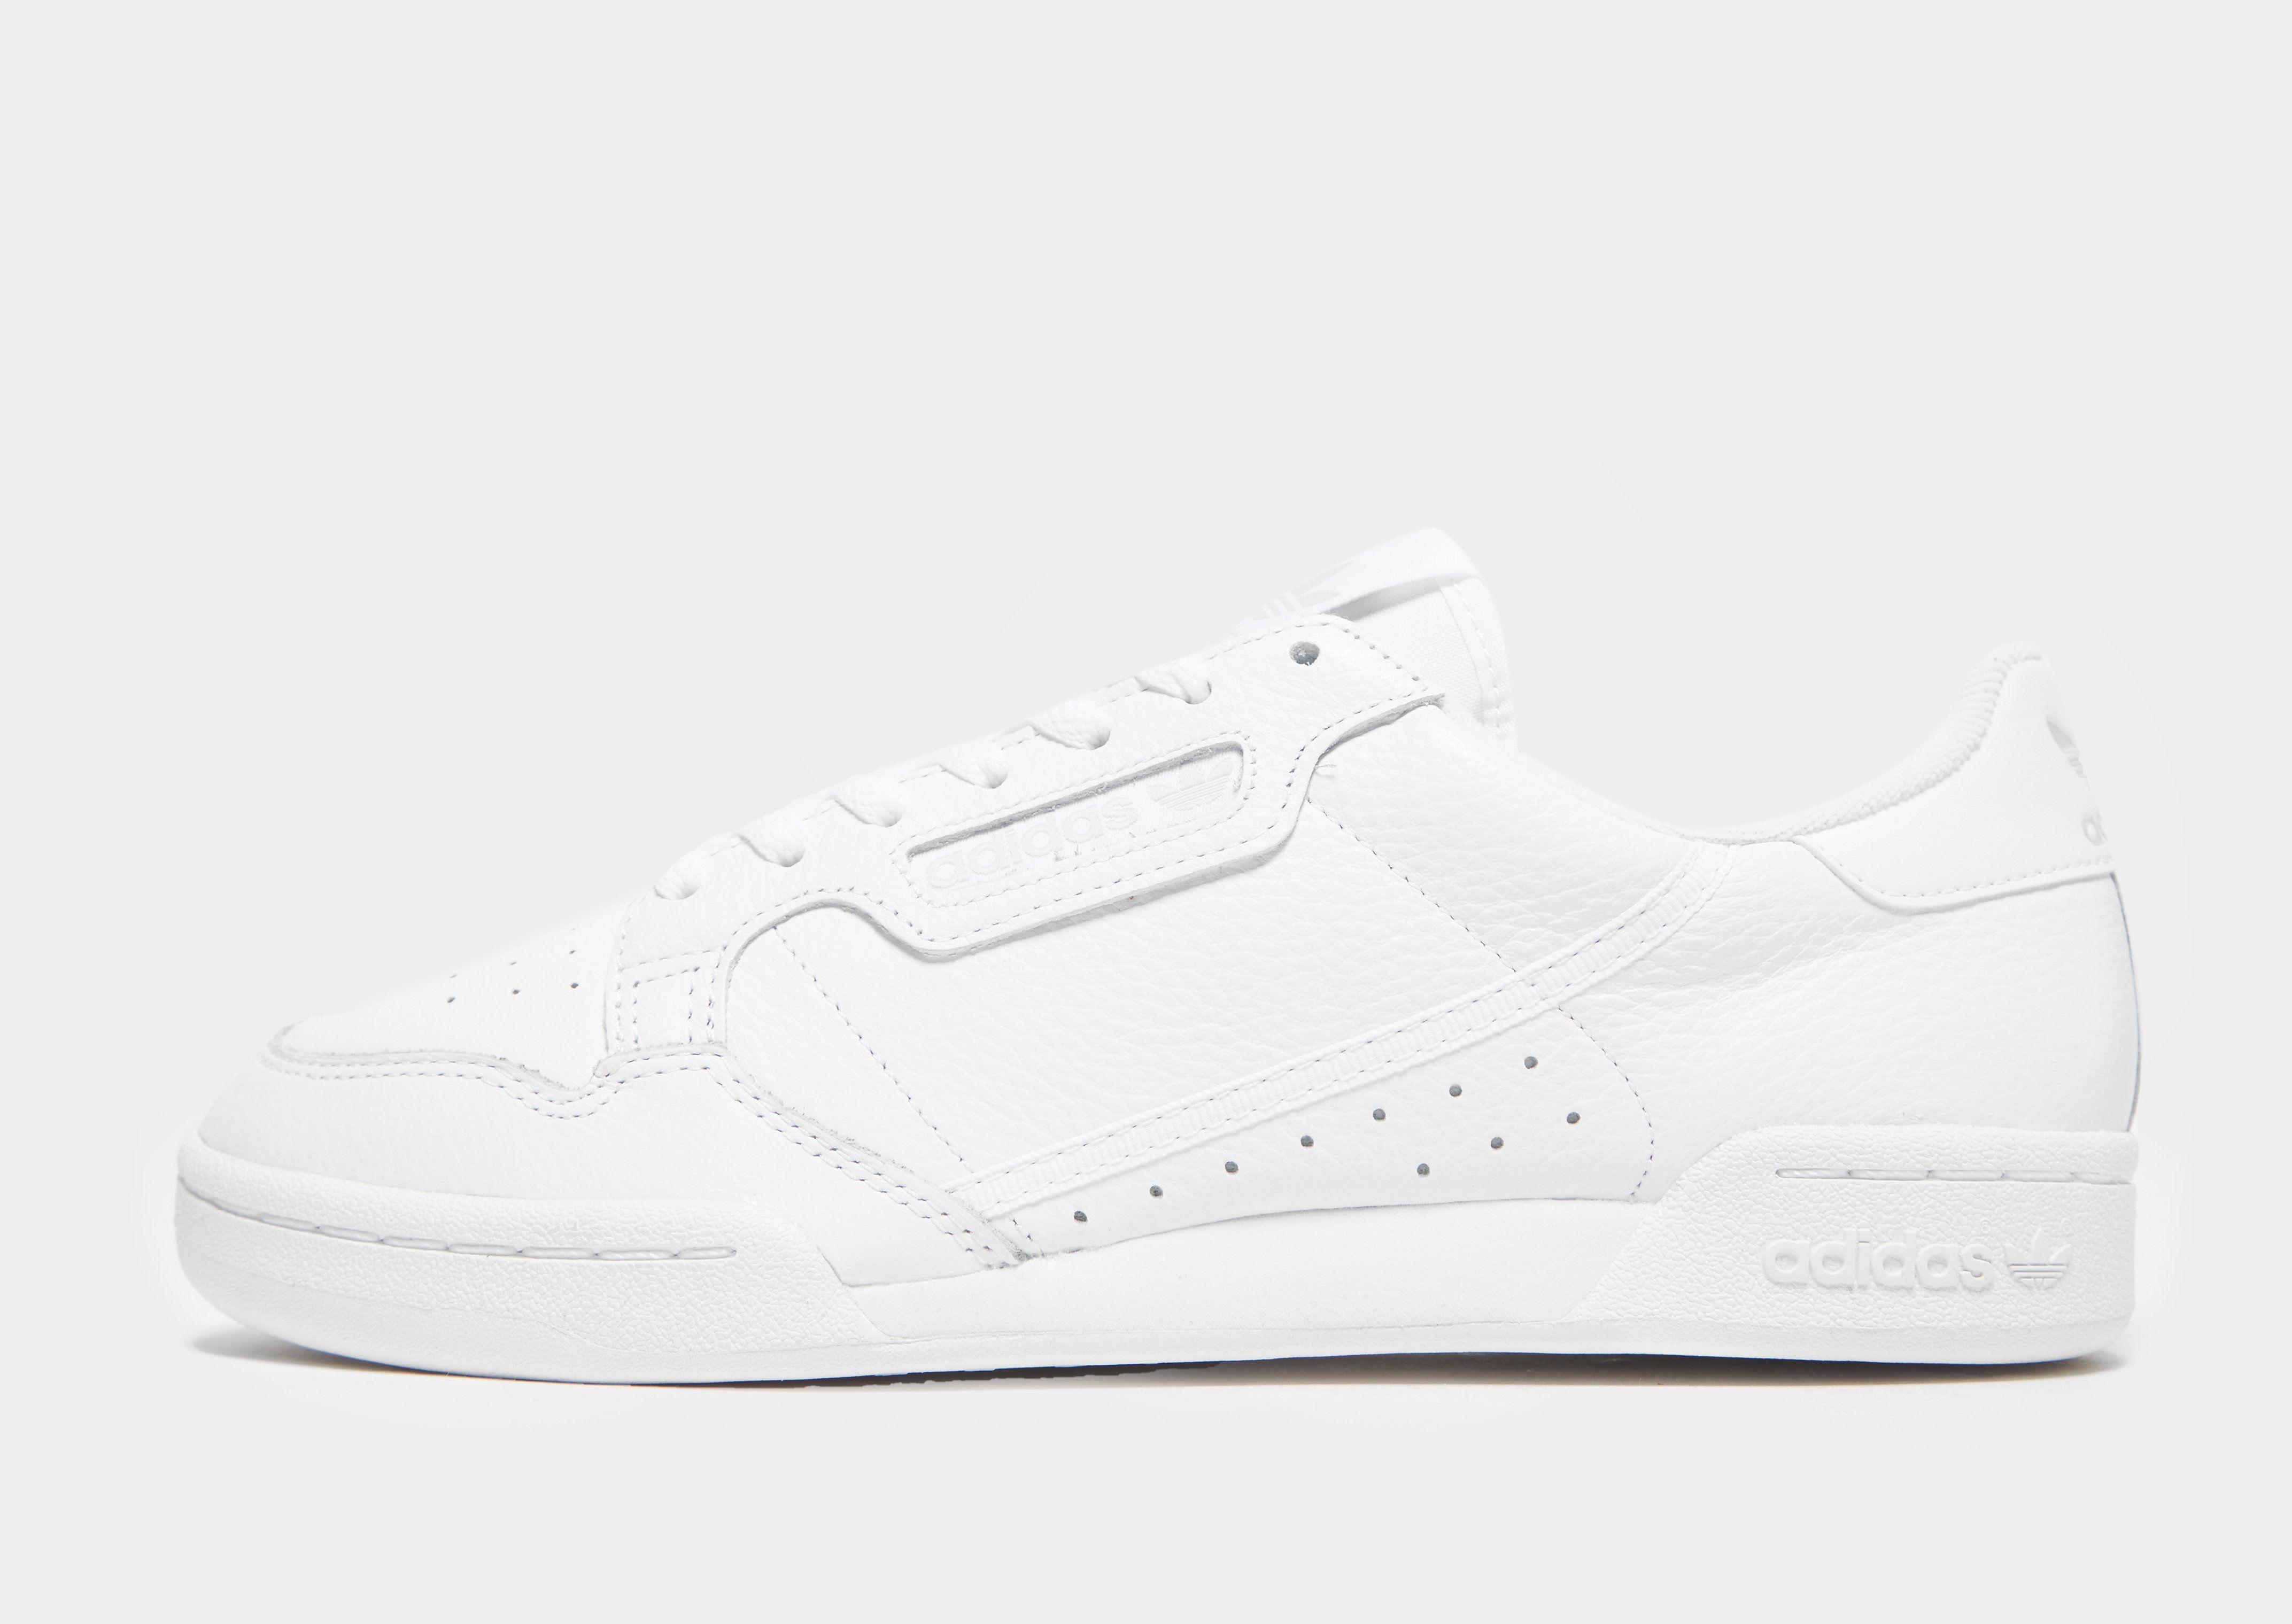 Adidas Originals Continental 80 Jd Sports